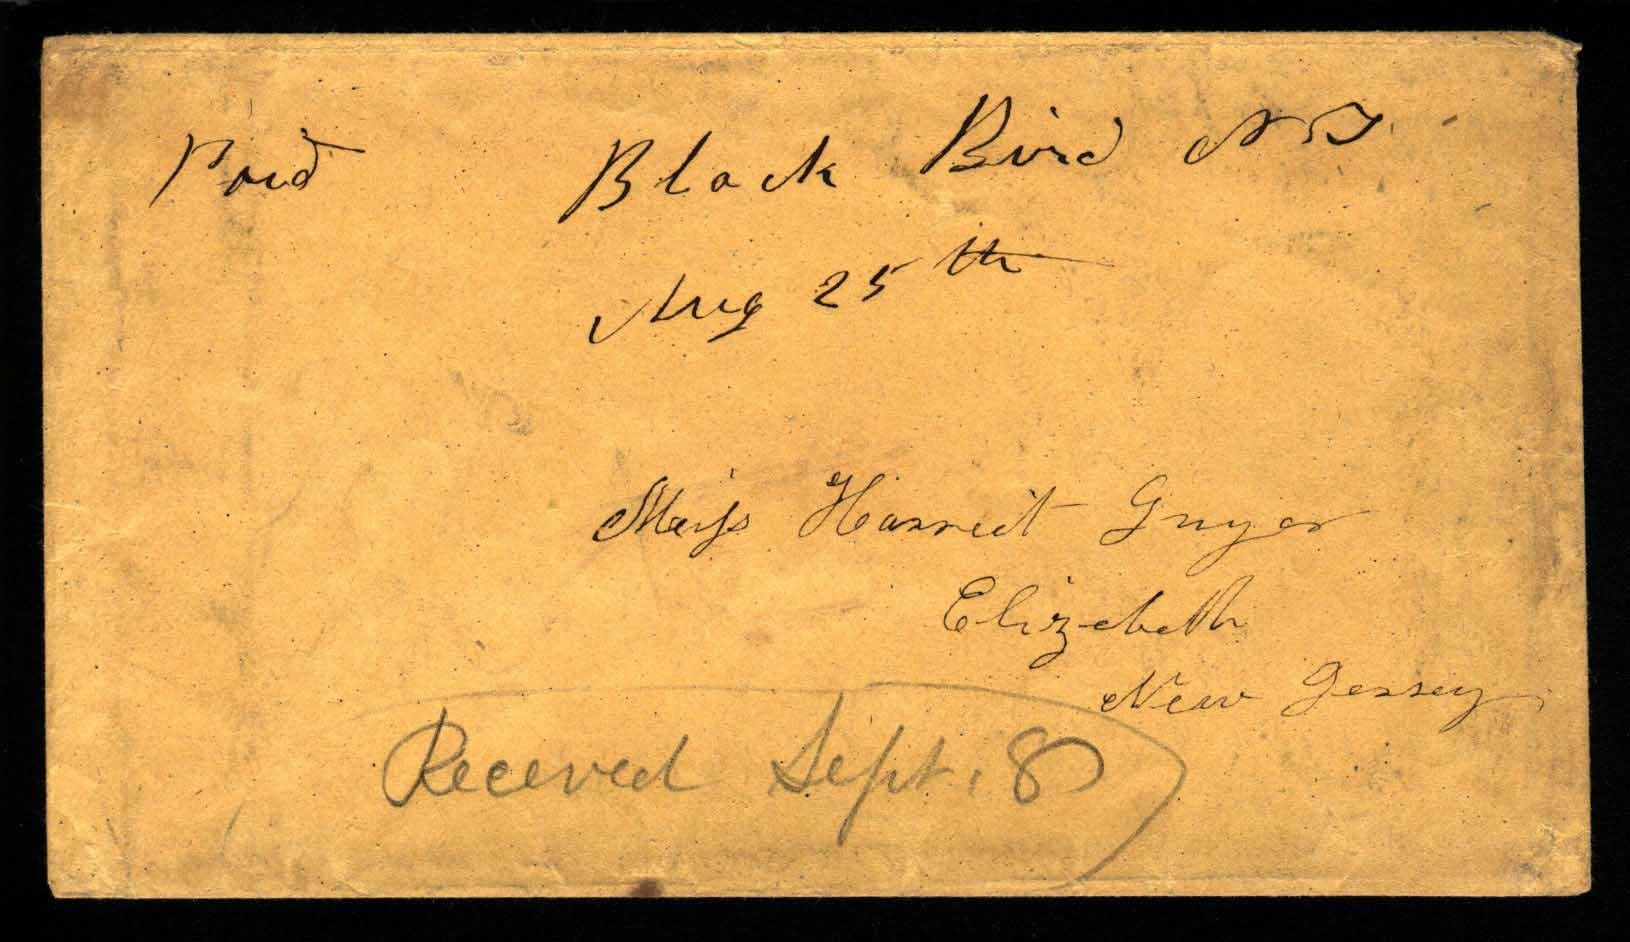 BlackBird 1857 08 25